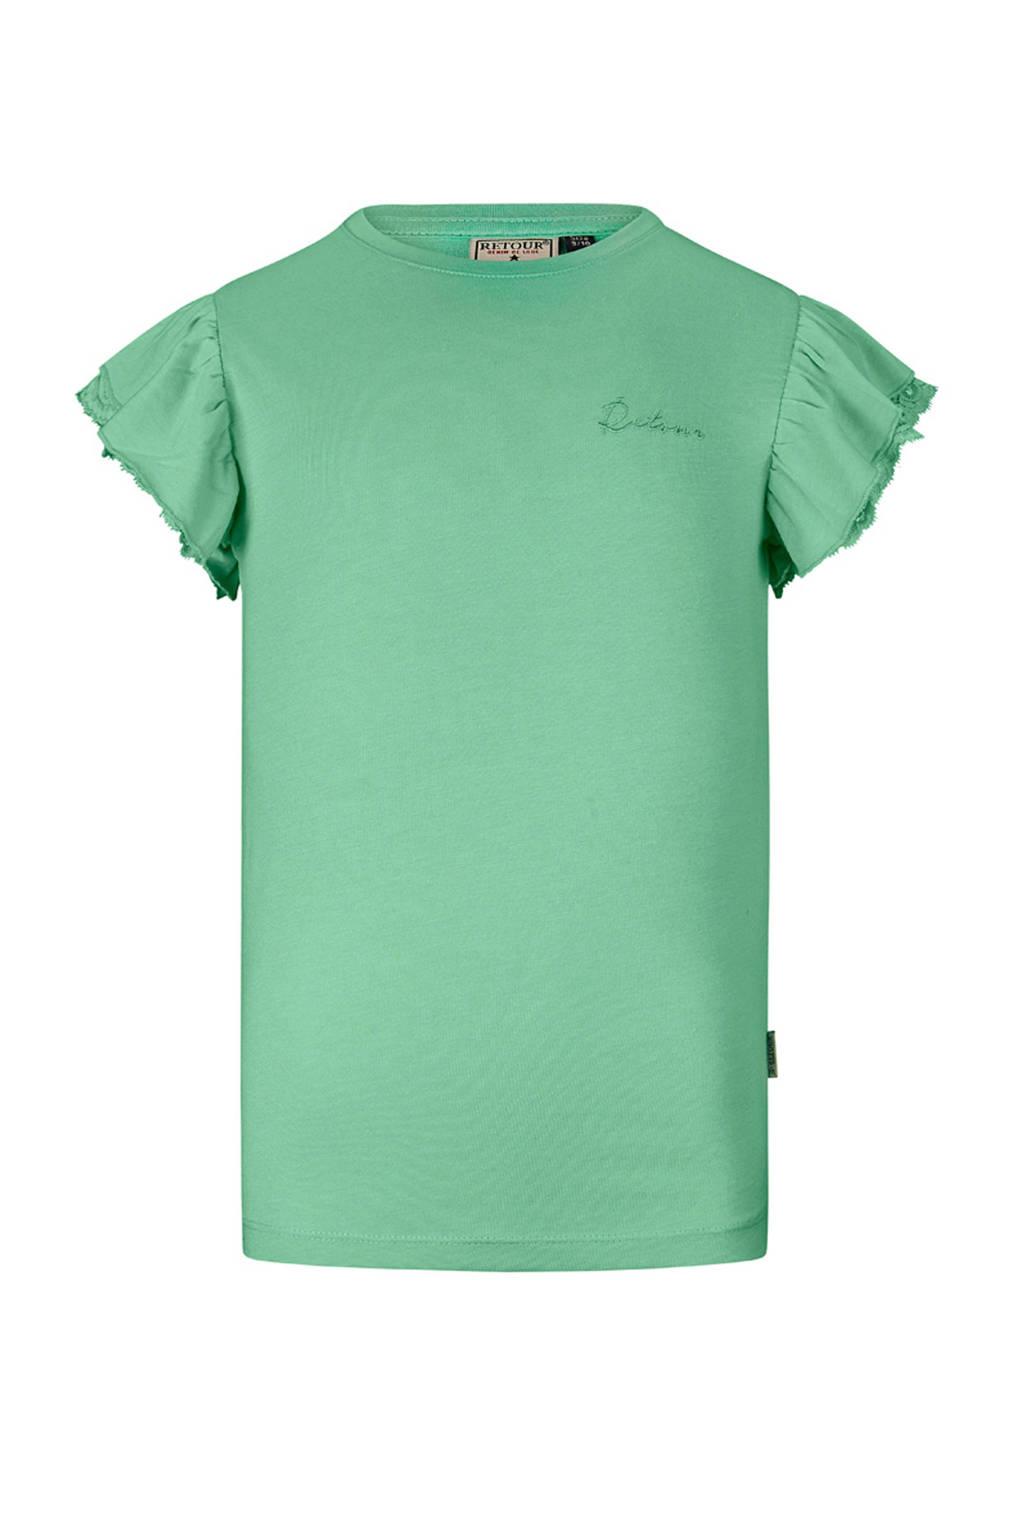 Retour Denim T-shirt Hanna met borduursels donker mintgroen